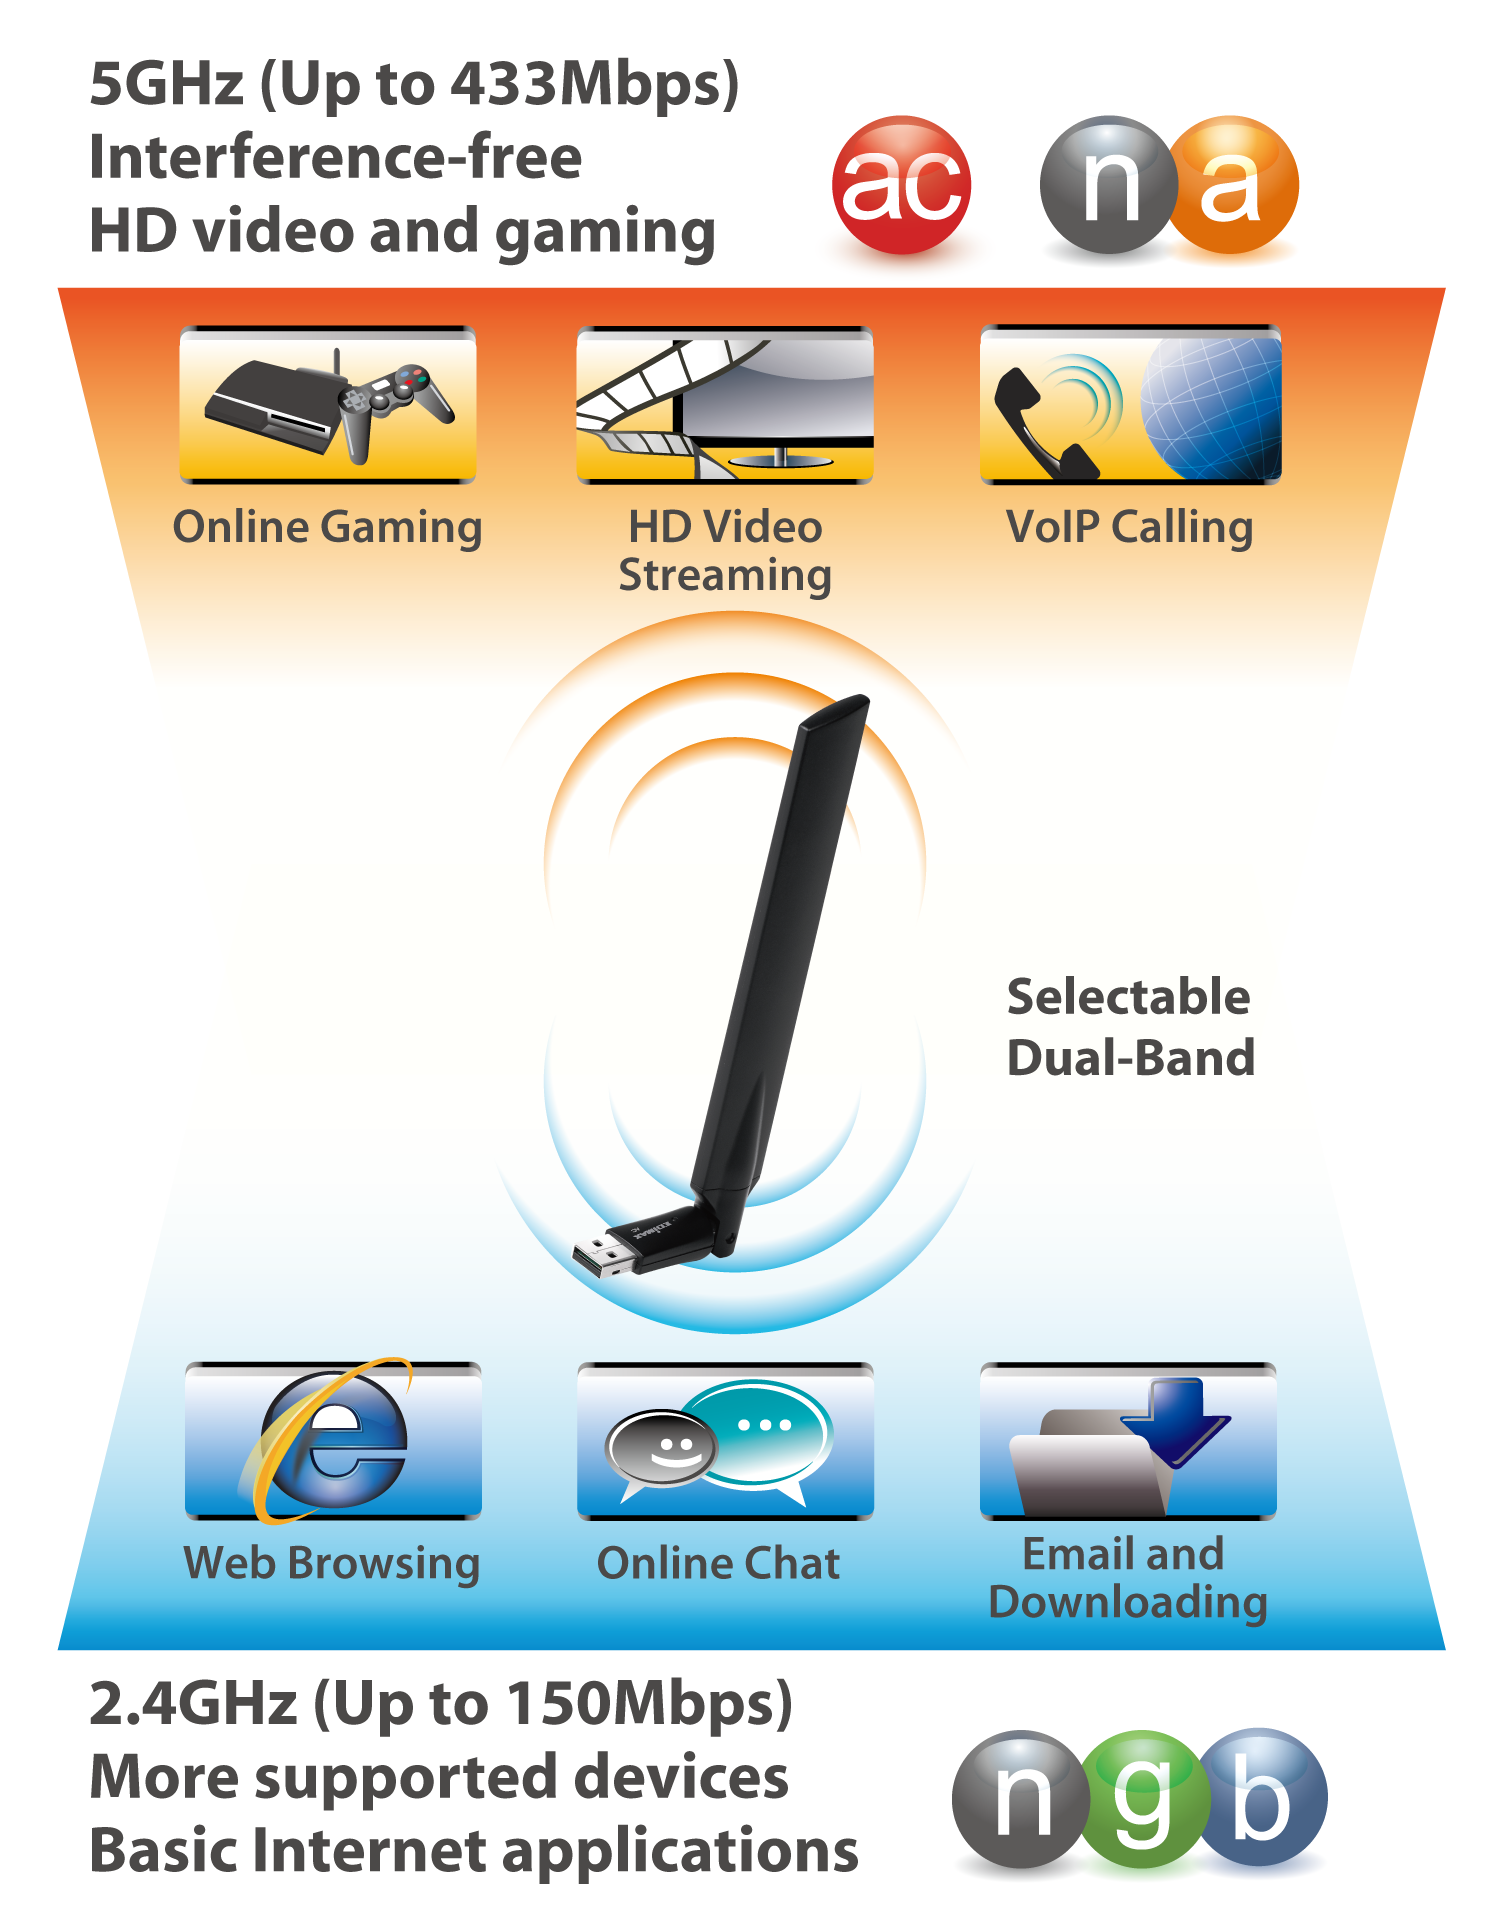 Edimax EW-7811UAC AC600 Wi-Fi Dual-Band High Gain USB Adapter EW-7811UAC_dual-band.png